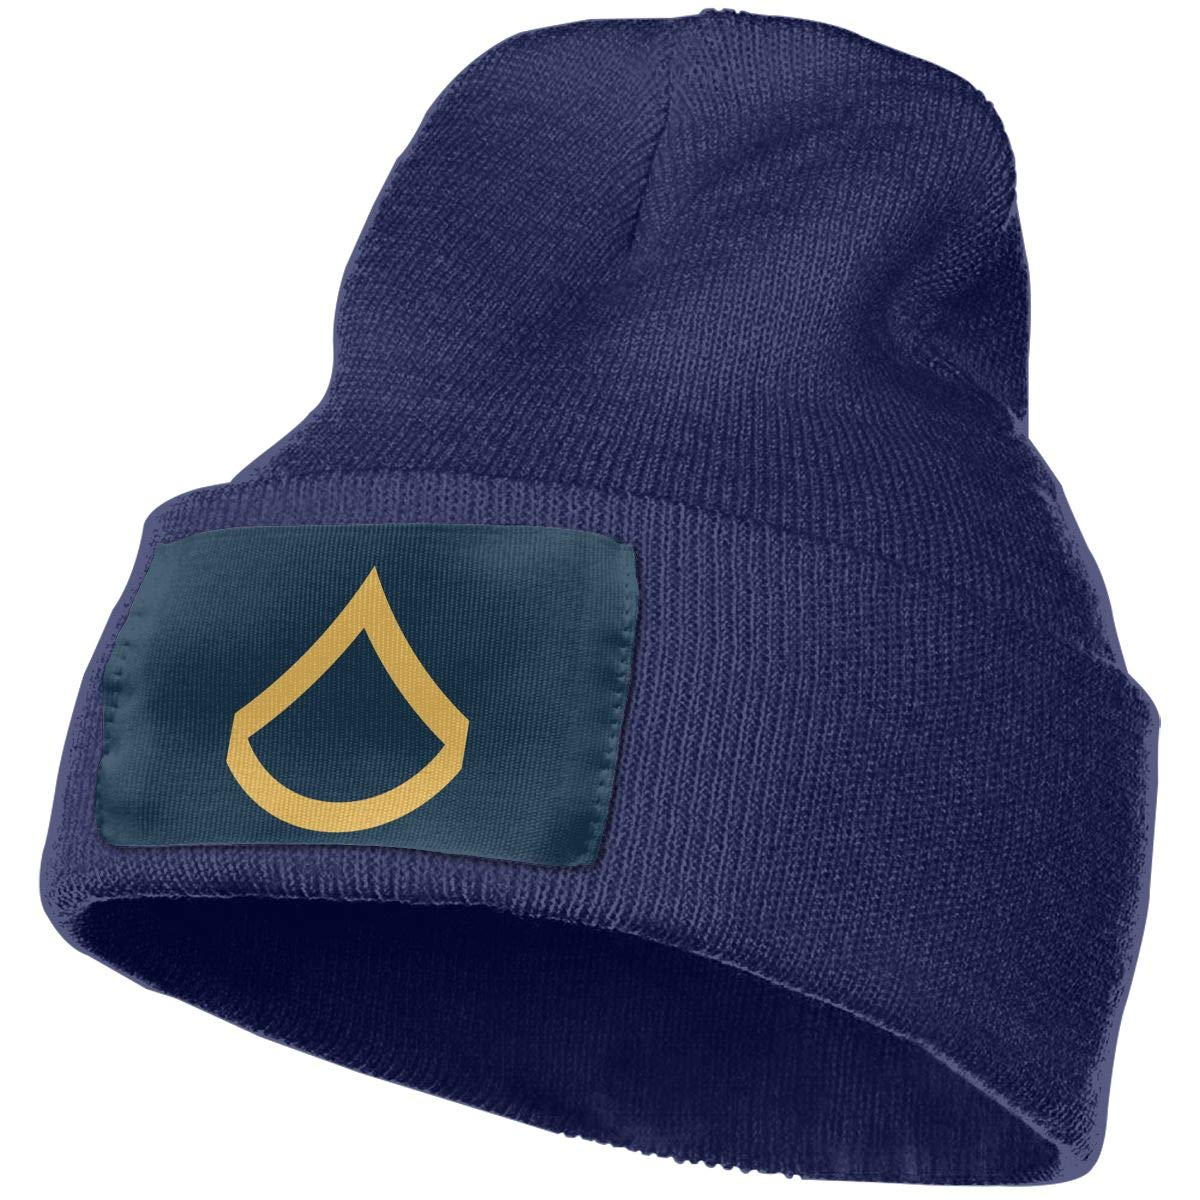 Army Private First Class E-3 Rank Insignia Men/&Women Warm Winter Knit Plain Beanie Hat Skull Cap Acrylic Knit Cuff Hat